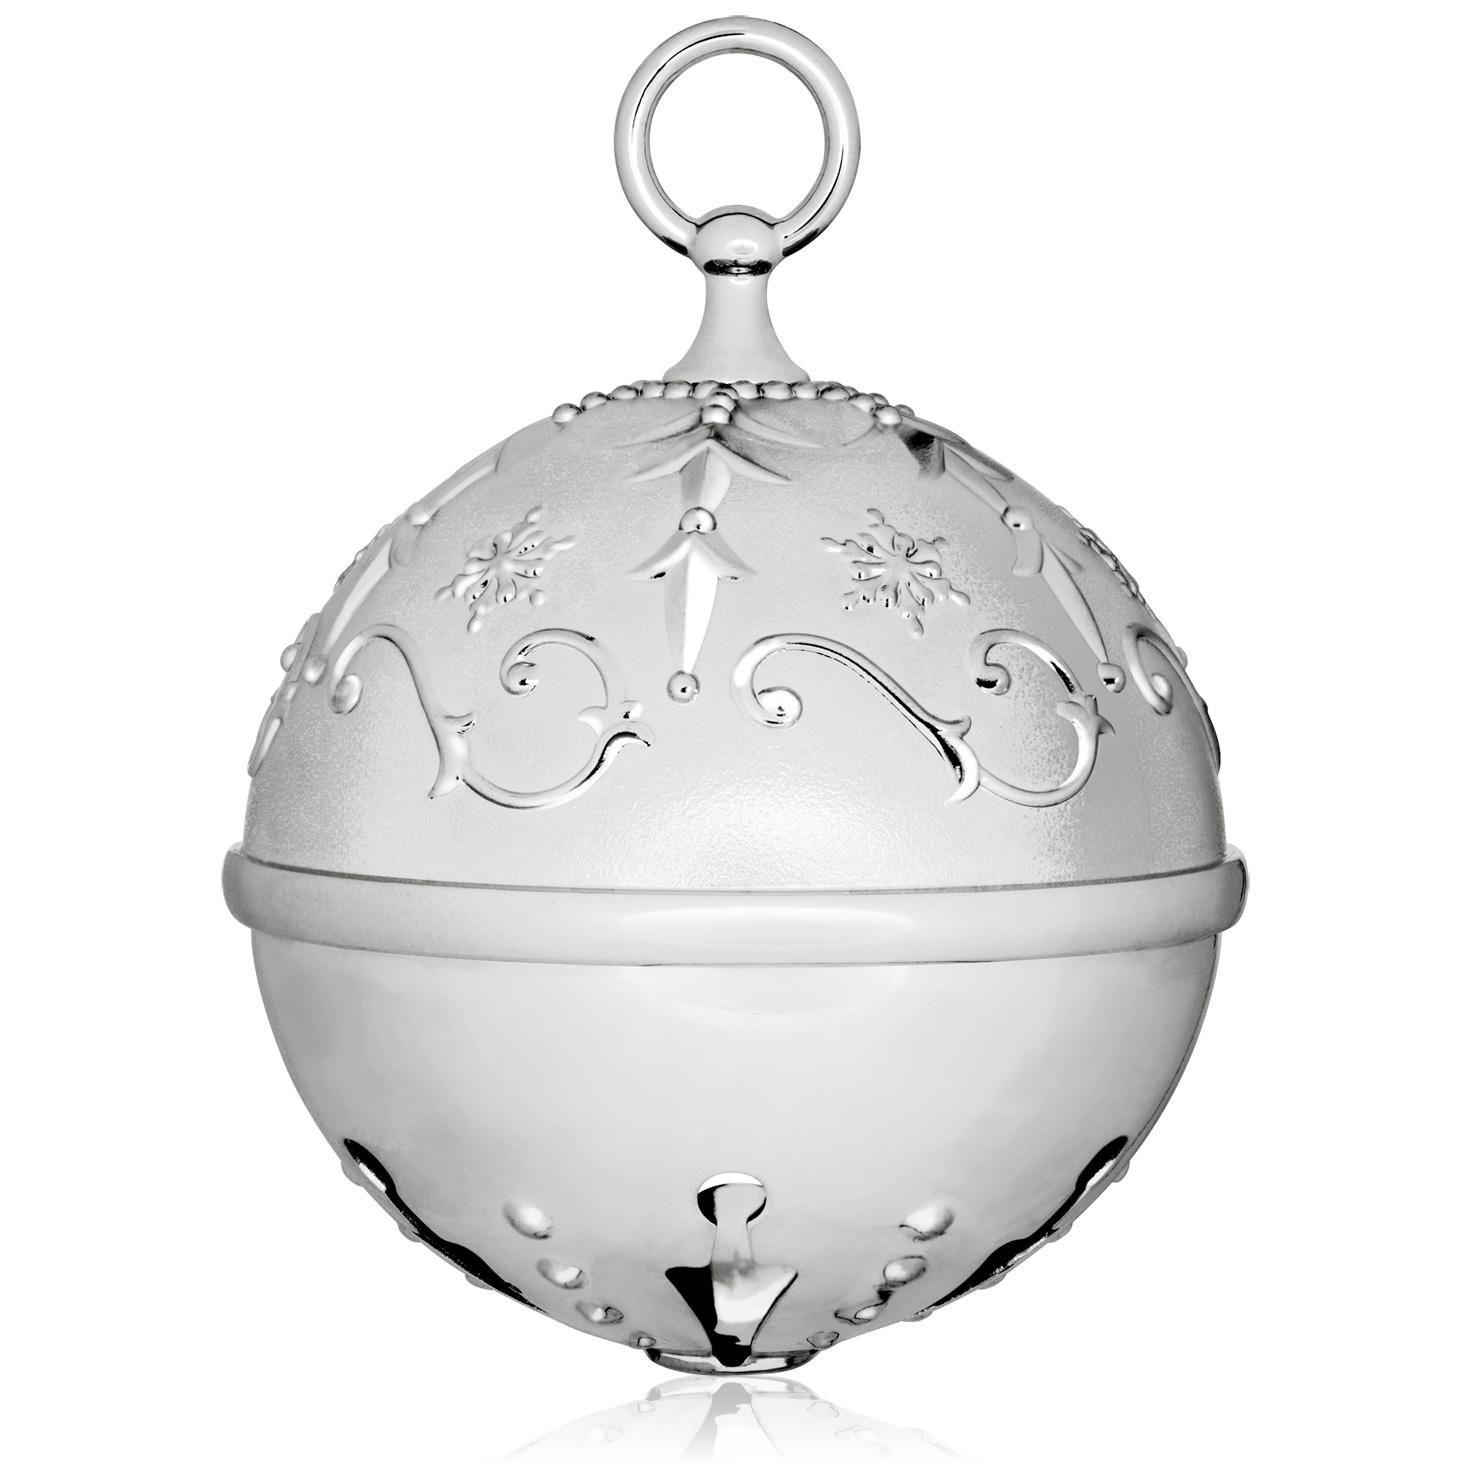 2015 ring in the season hallmark keepsake ornament hooked on hallmark ornaments - Christmas Ornament Ring Box